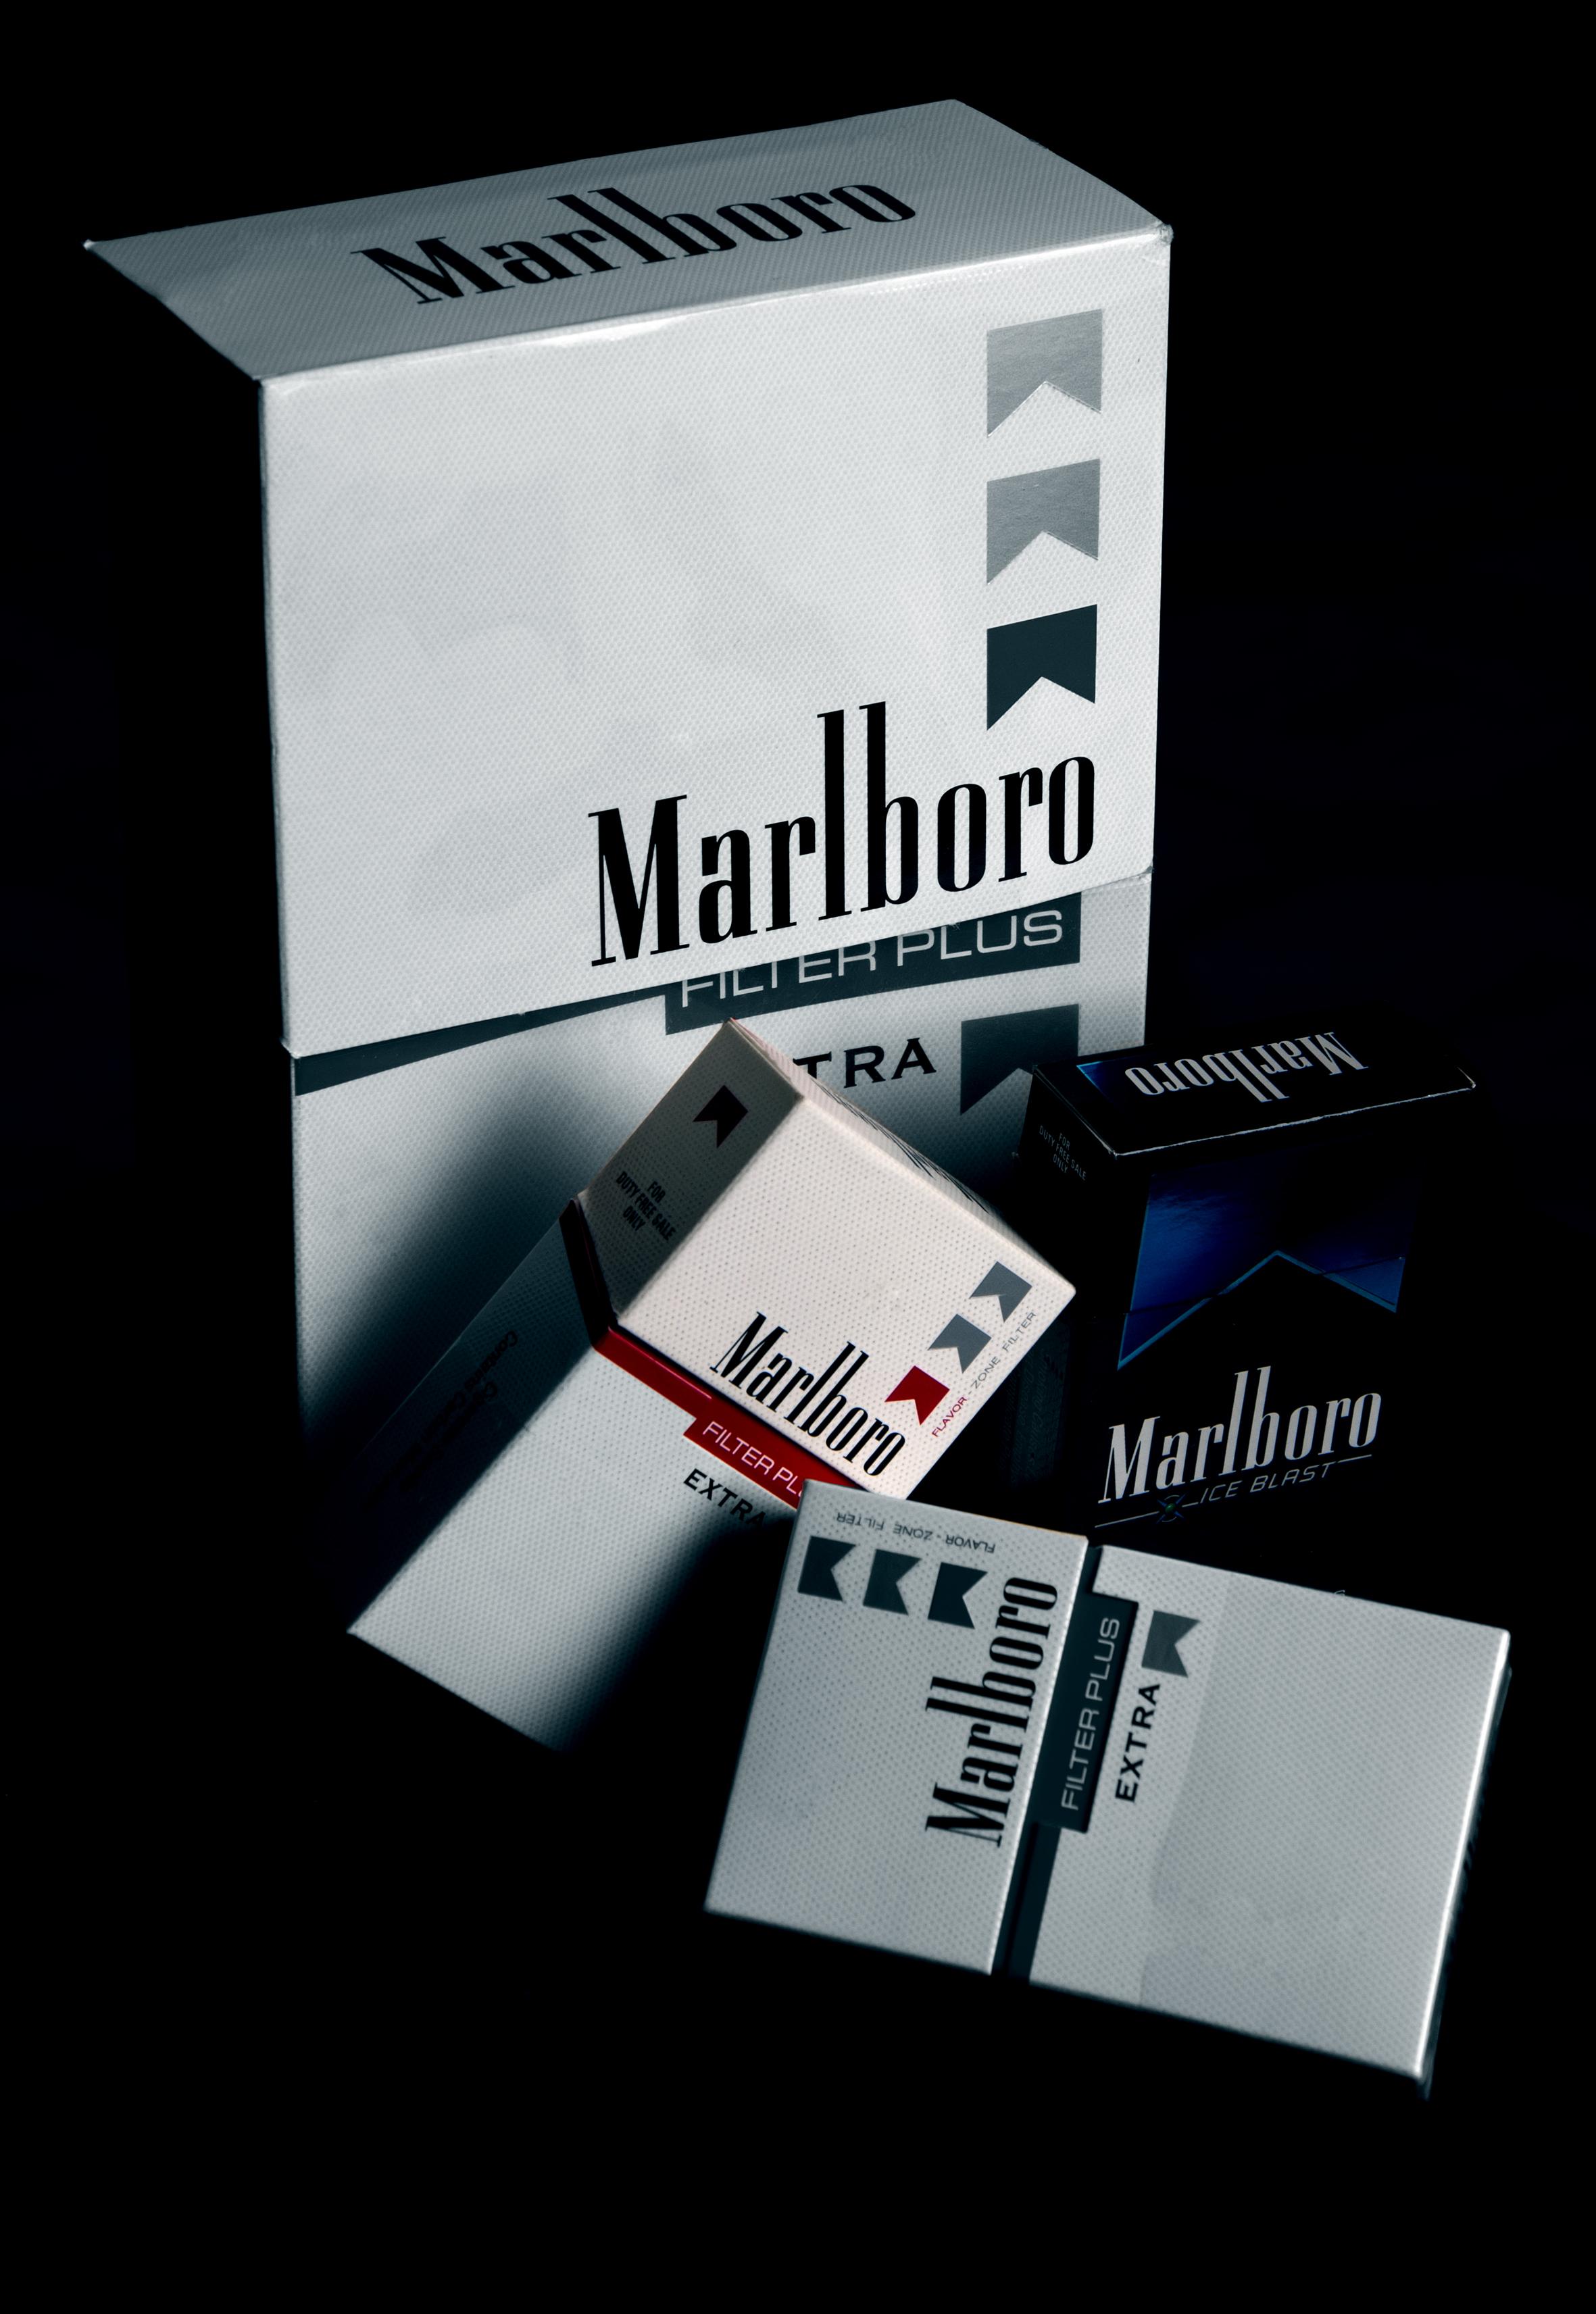 Black Wallpaper Iphone 5 Free Stock Photo Of Cigar Cigarette Smoker